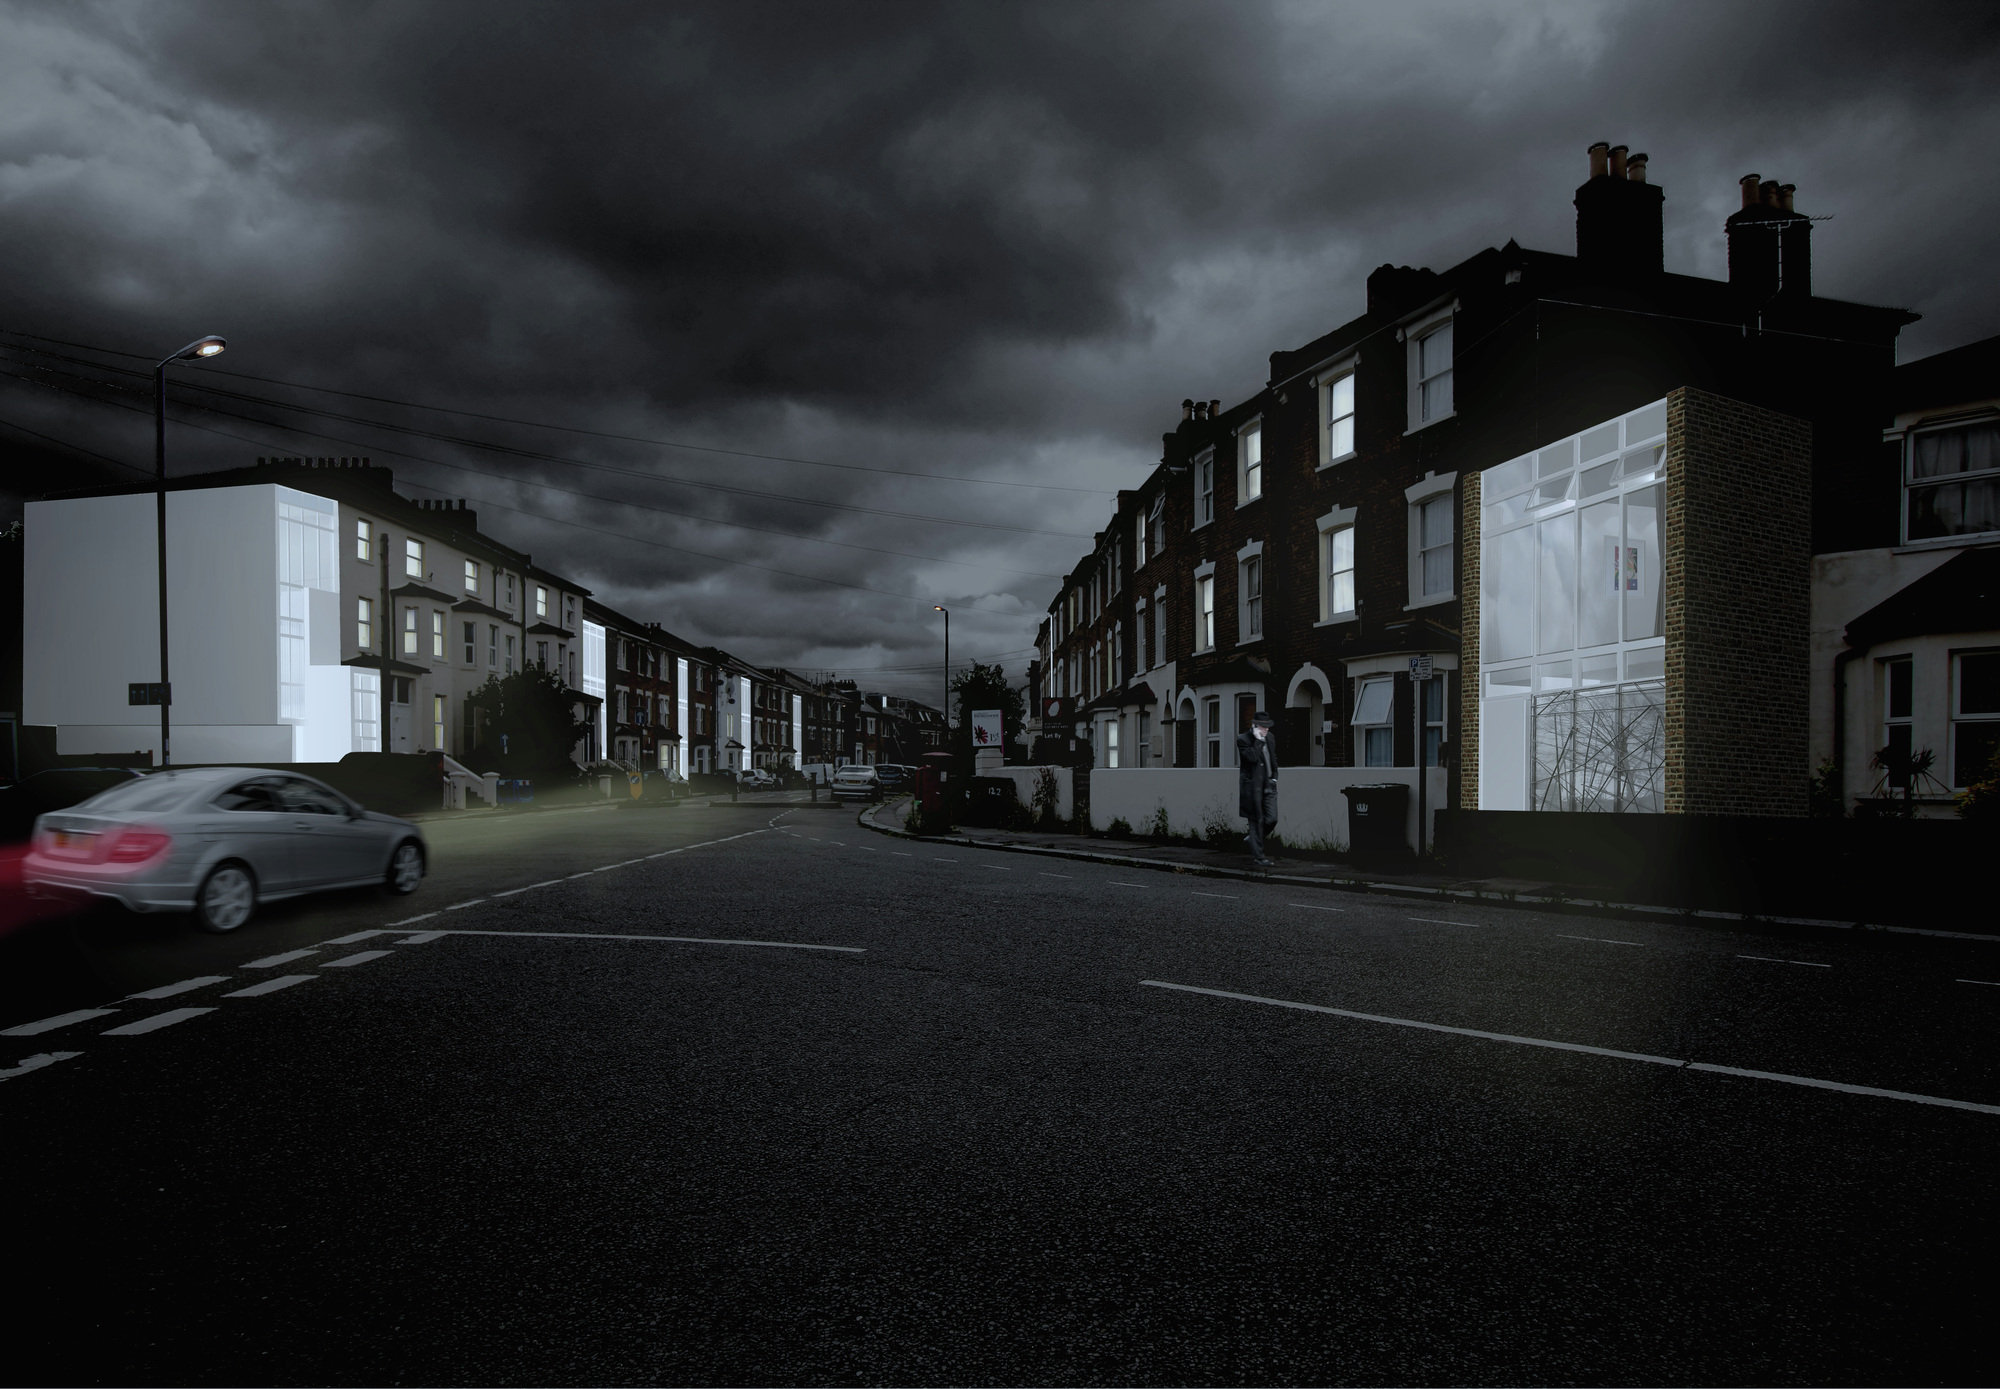 Gap Housing By Akira Yamanaka. Image Courtesy Of New London Architecture